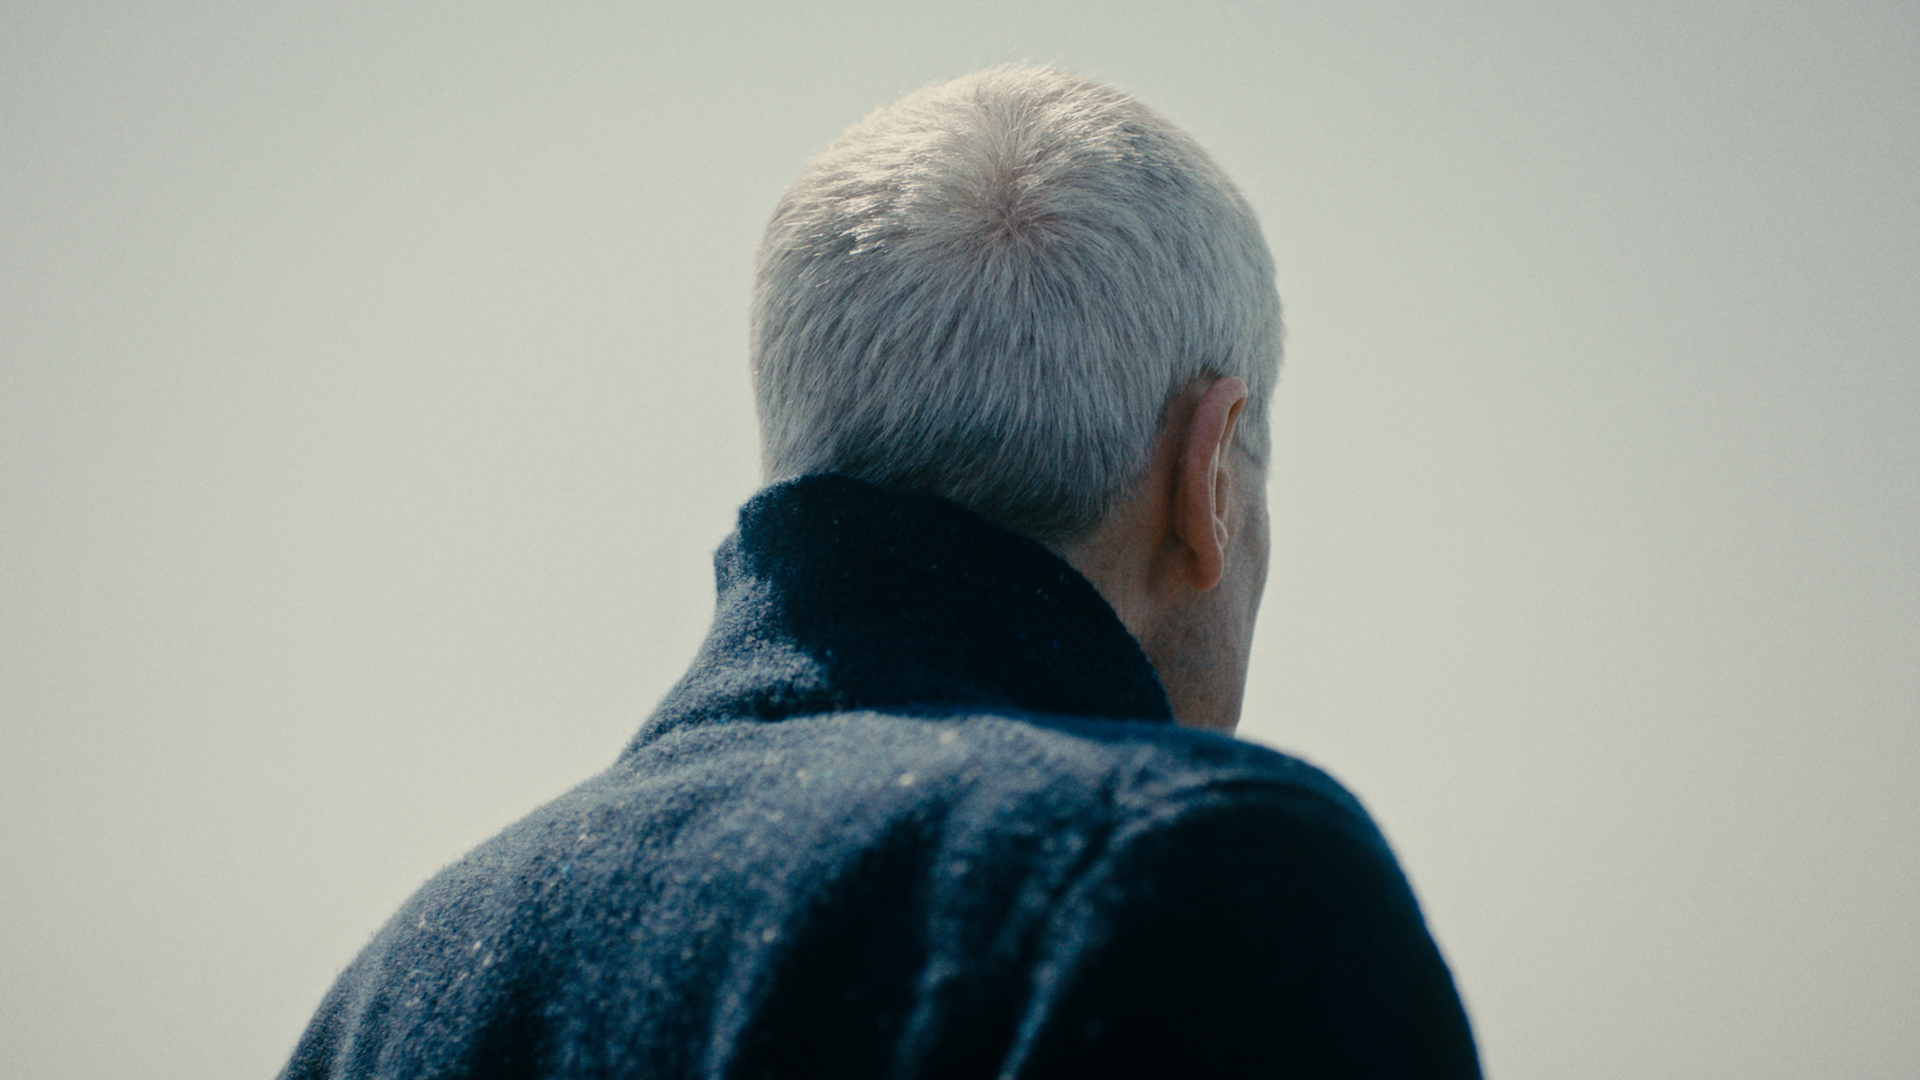 KYLE MACFADZEAN - Screen+Shot+2018-08-25+at+11.50.44